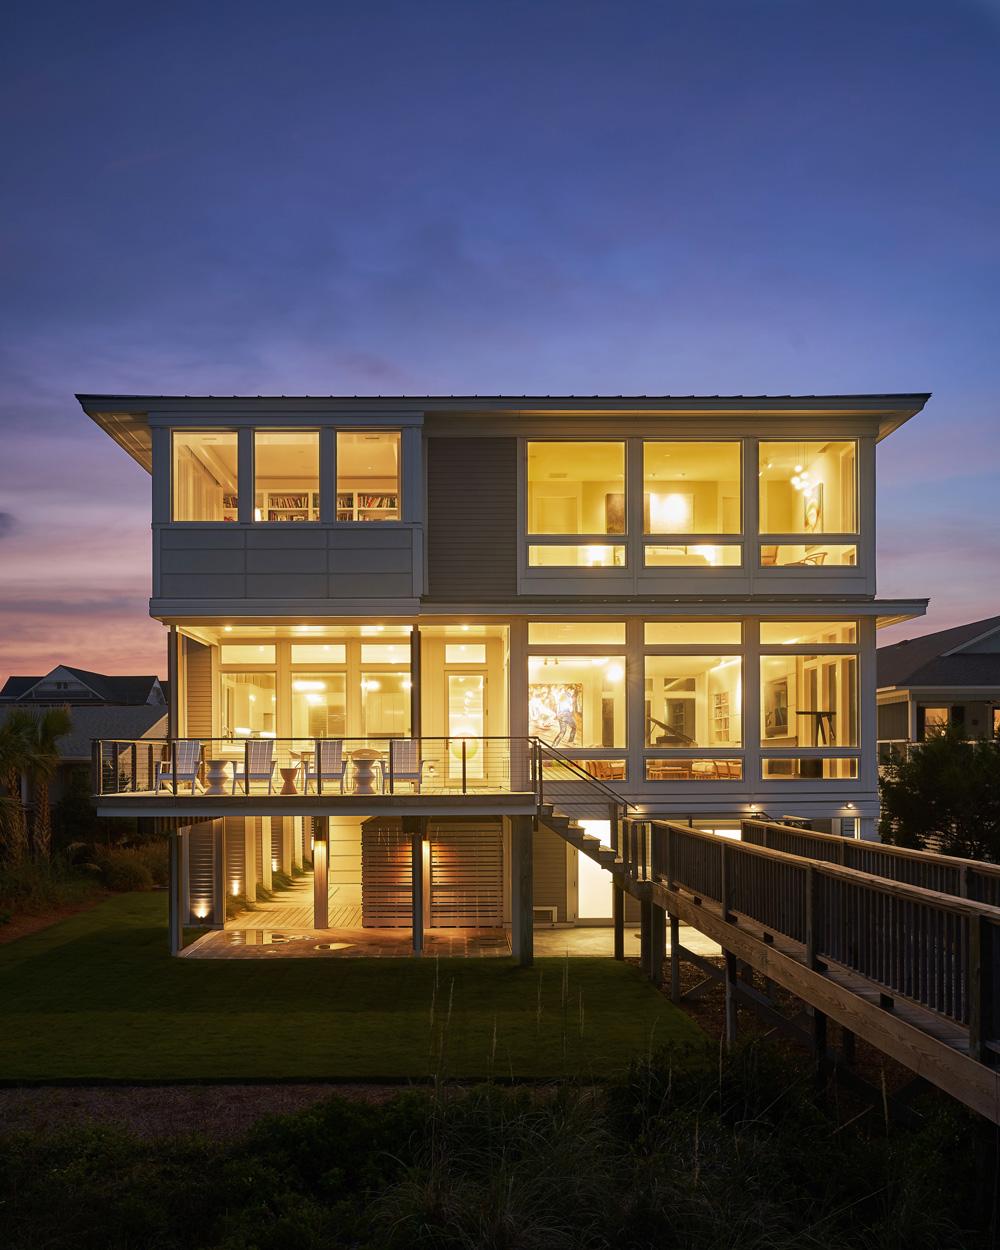 Kersting_Architecture_Surf_Gallery_031_web.jpg